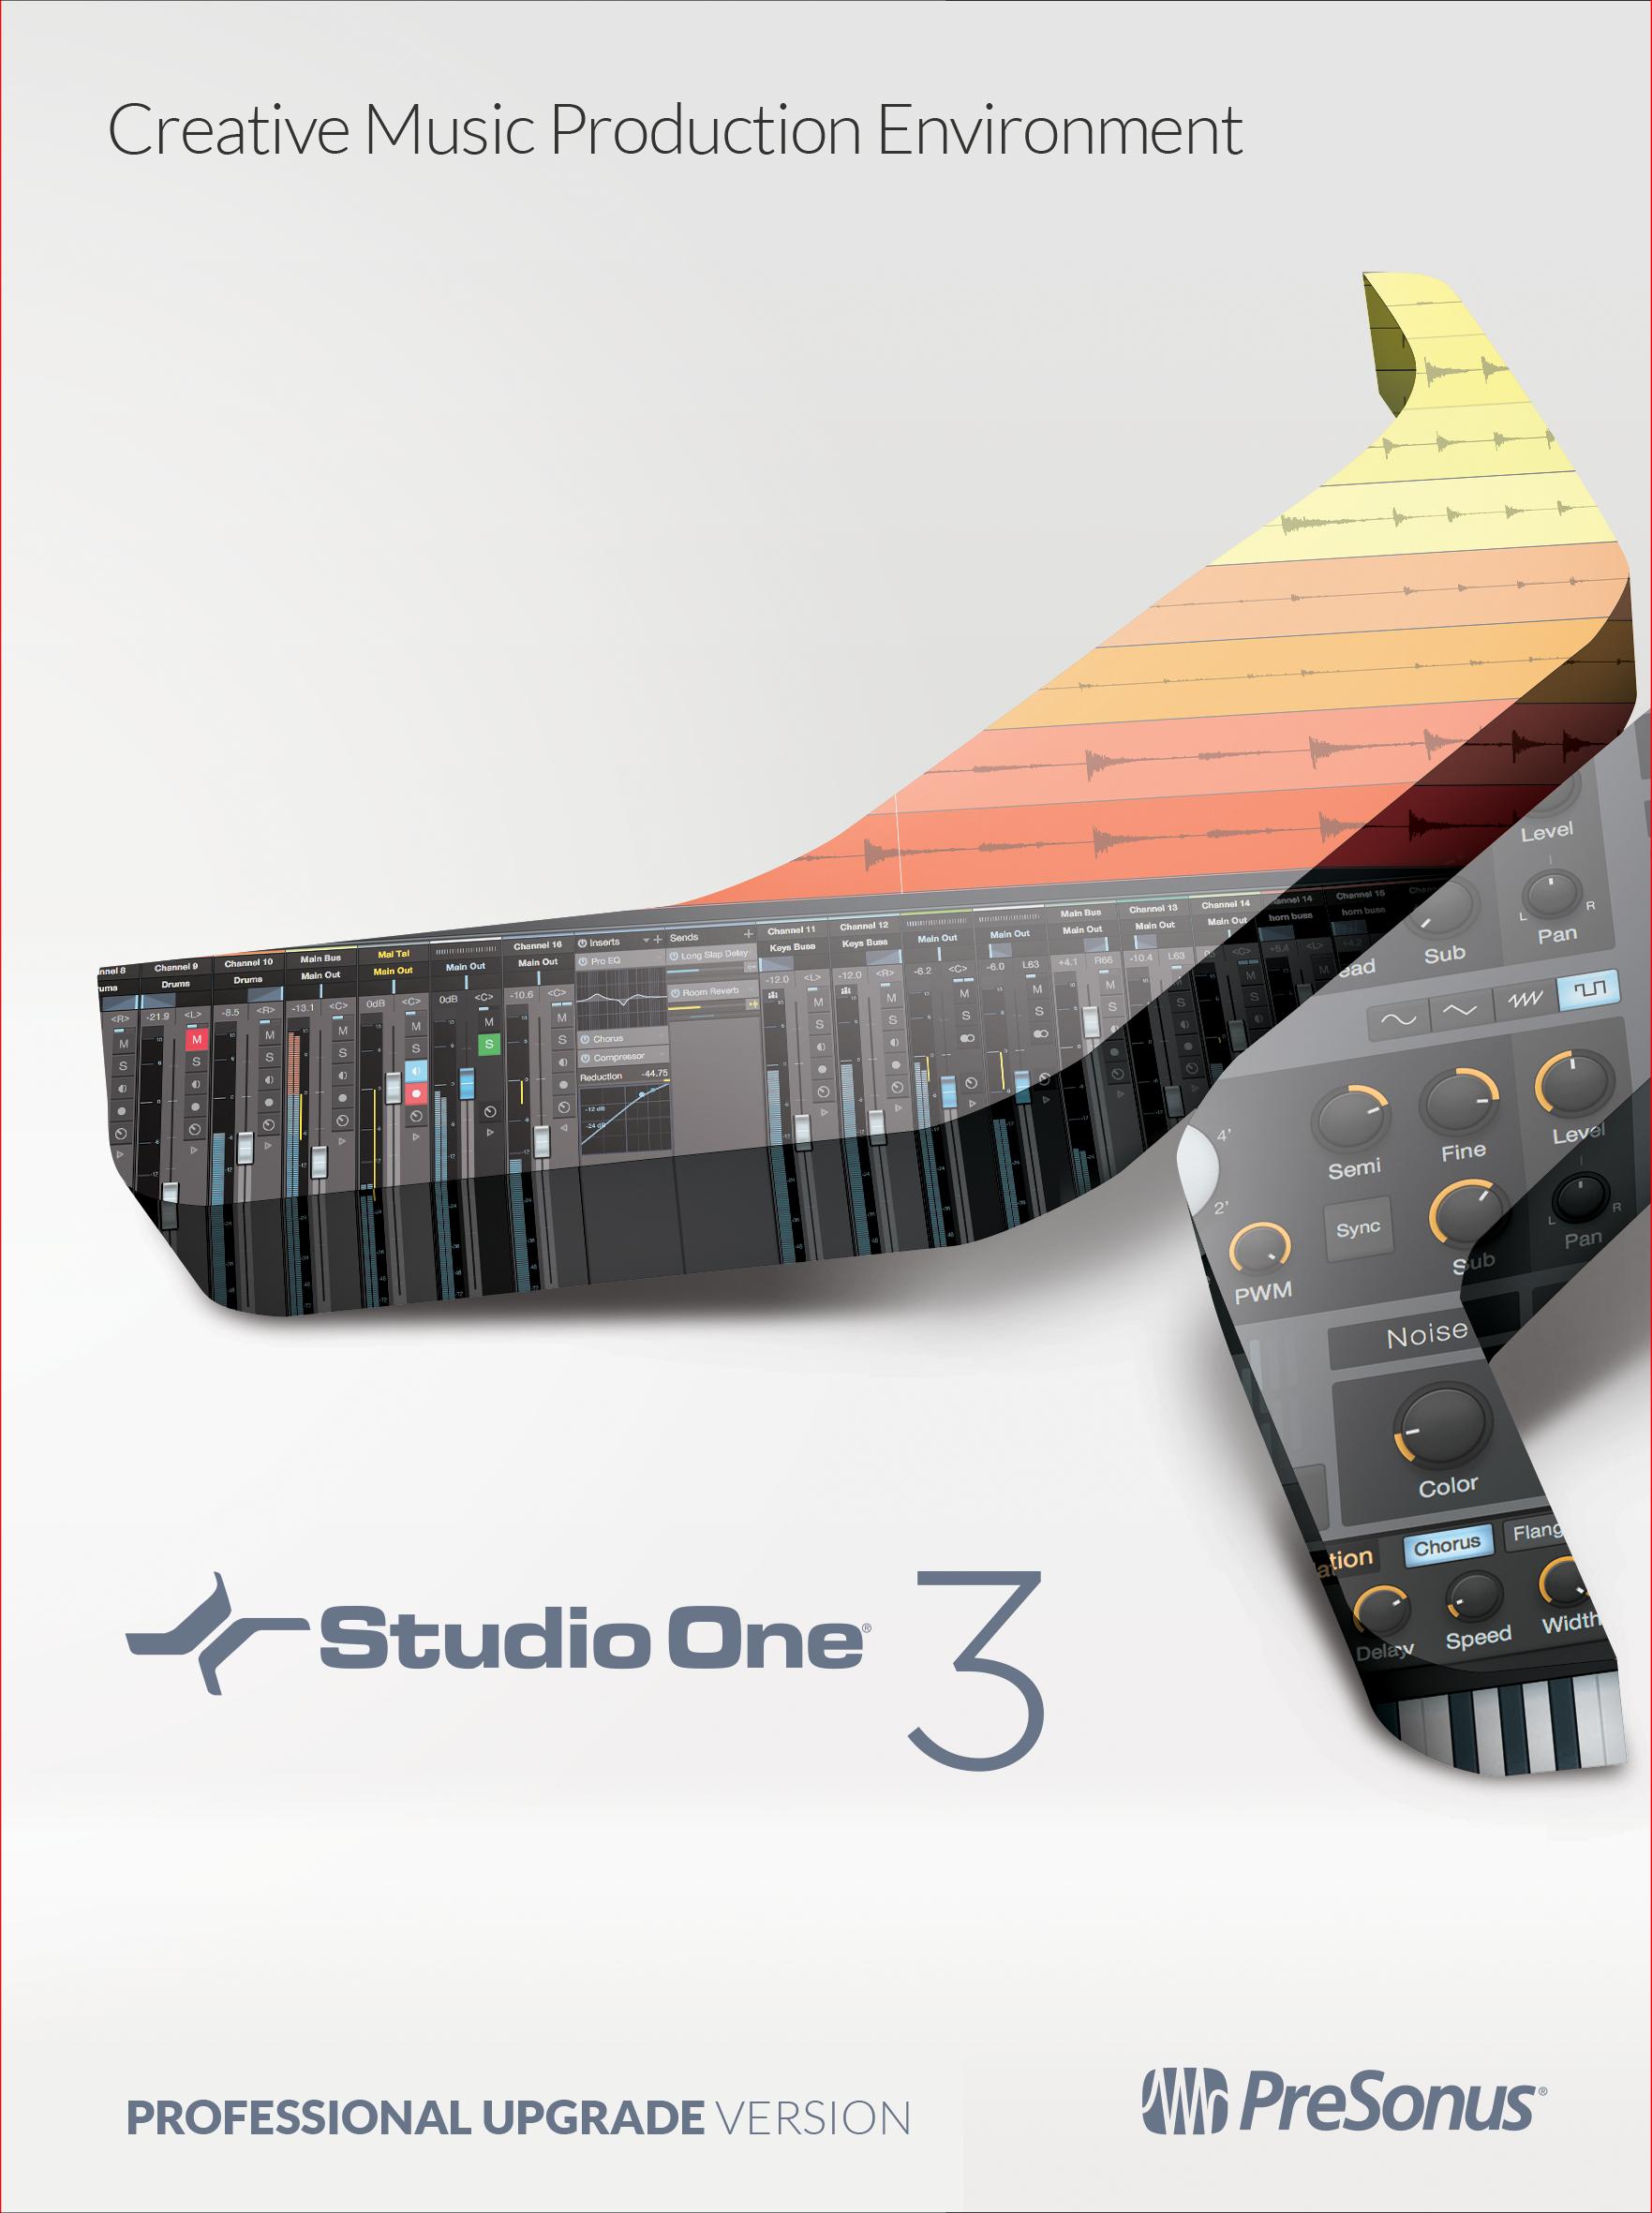 PreSonus Studio One Professional 1 or 2 to Studio